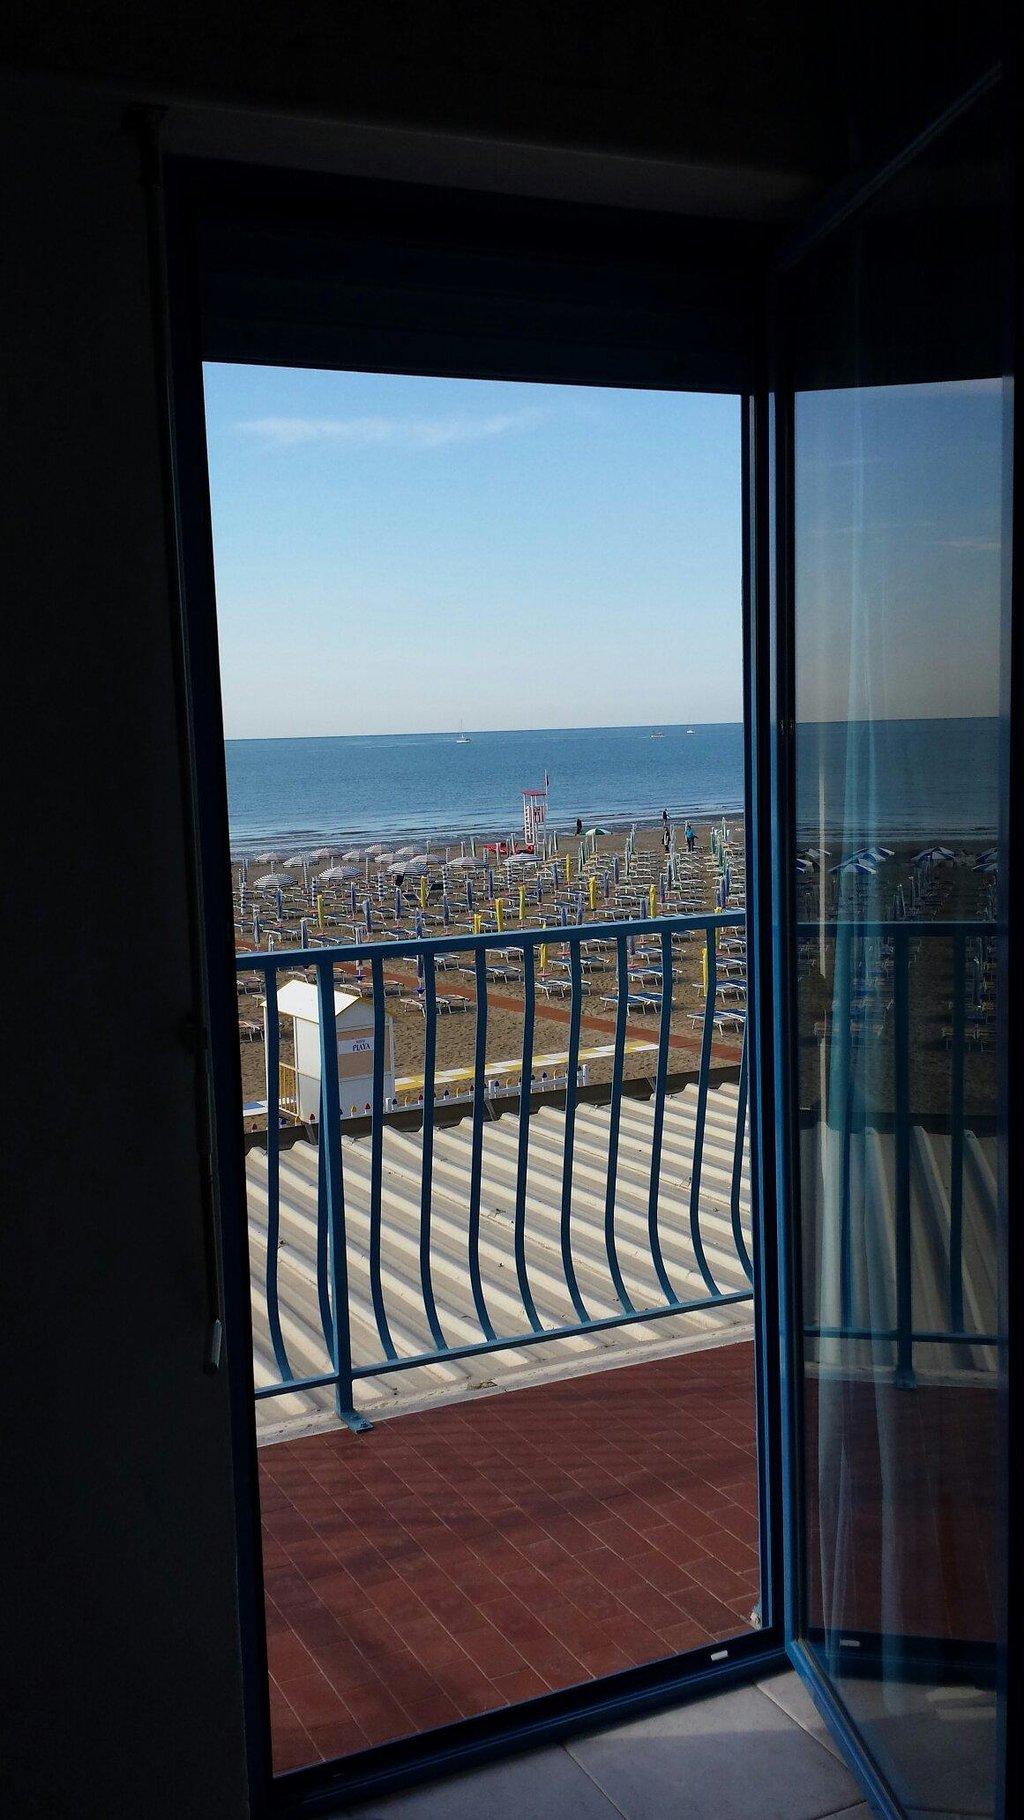 Hotel Playa e Mare Nostrum